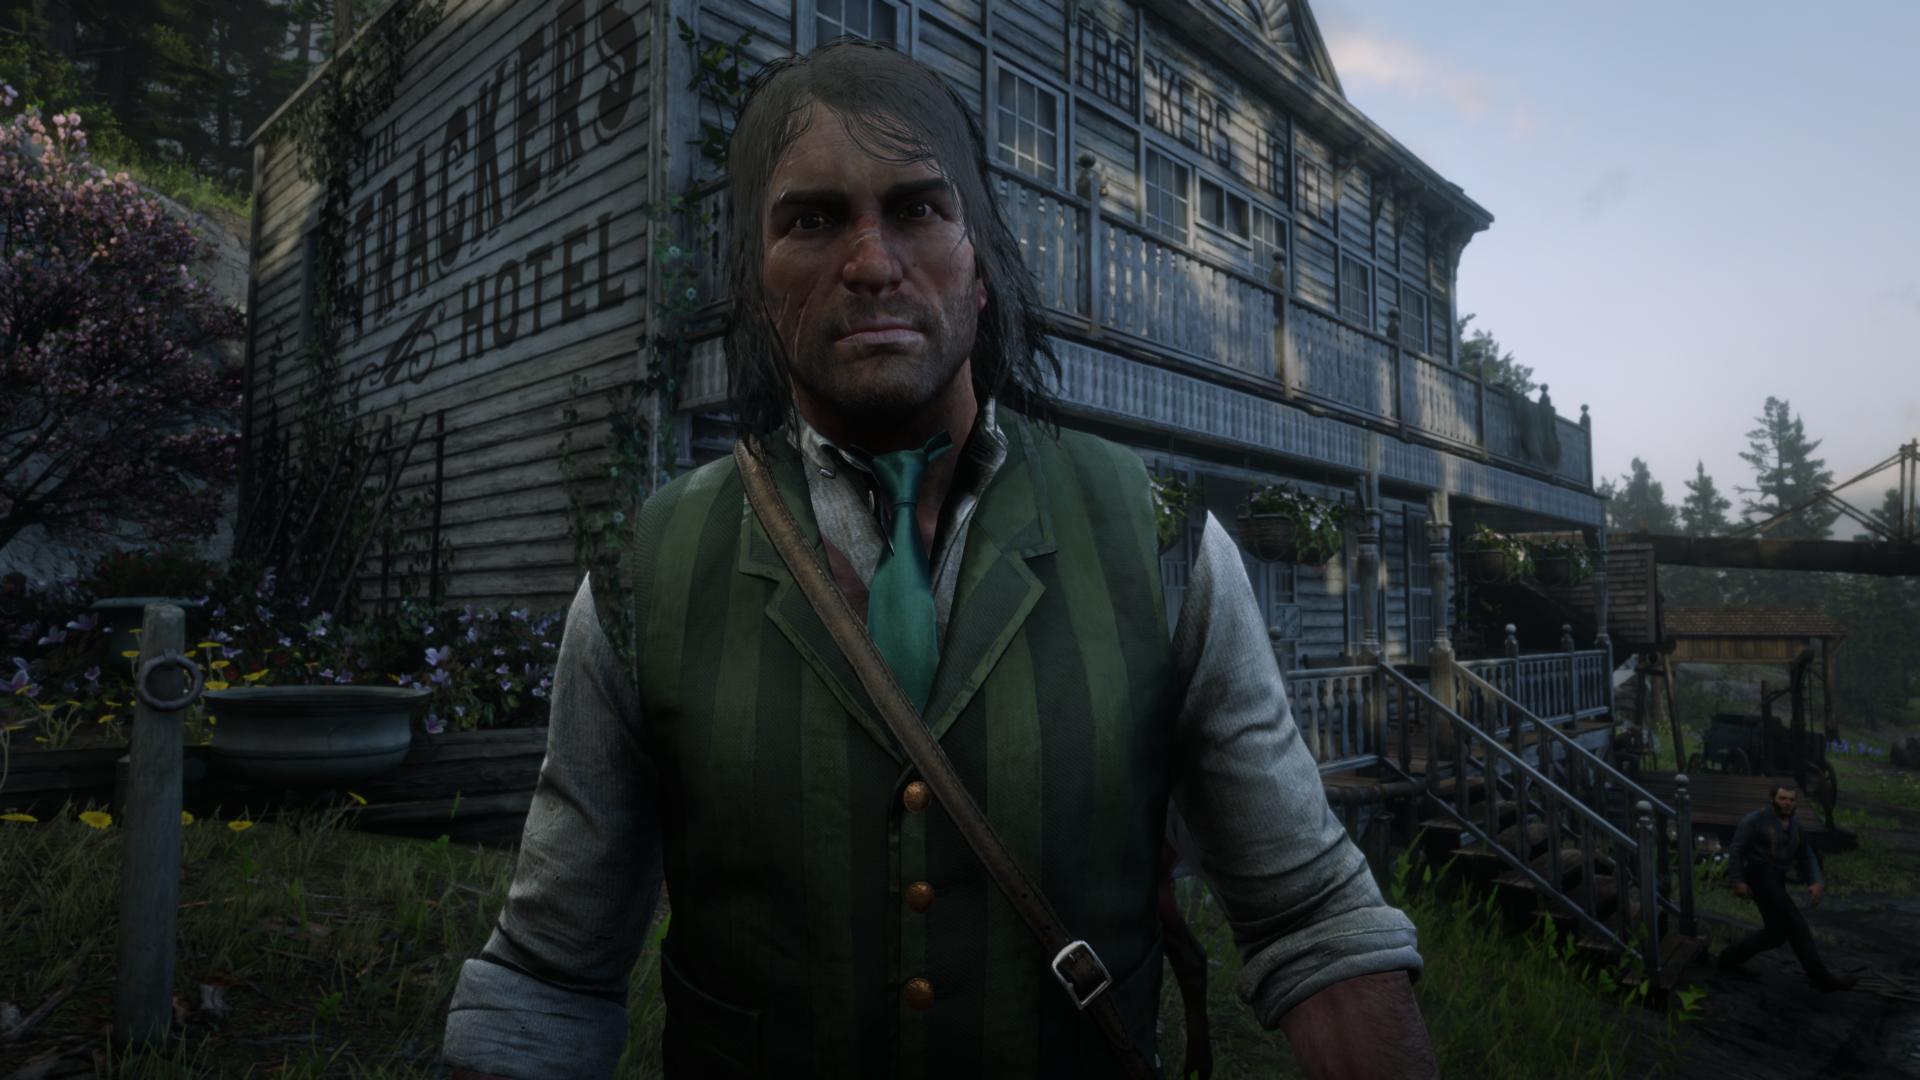 Red_Dead_Redemption_2_Screenshot_2021.04